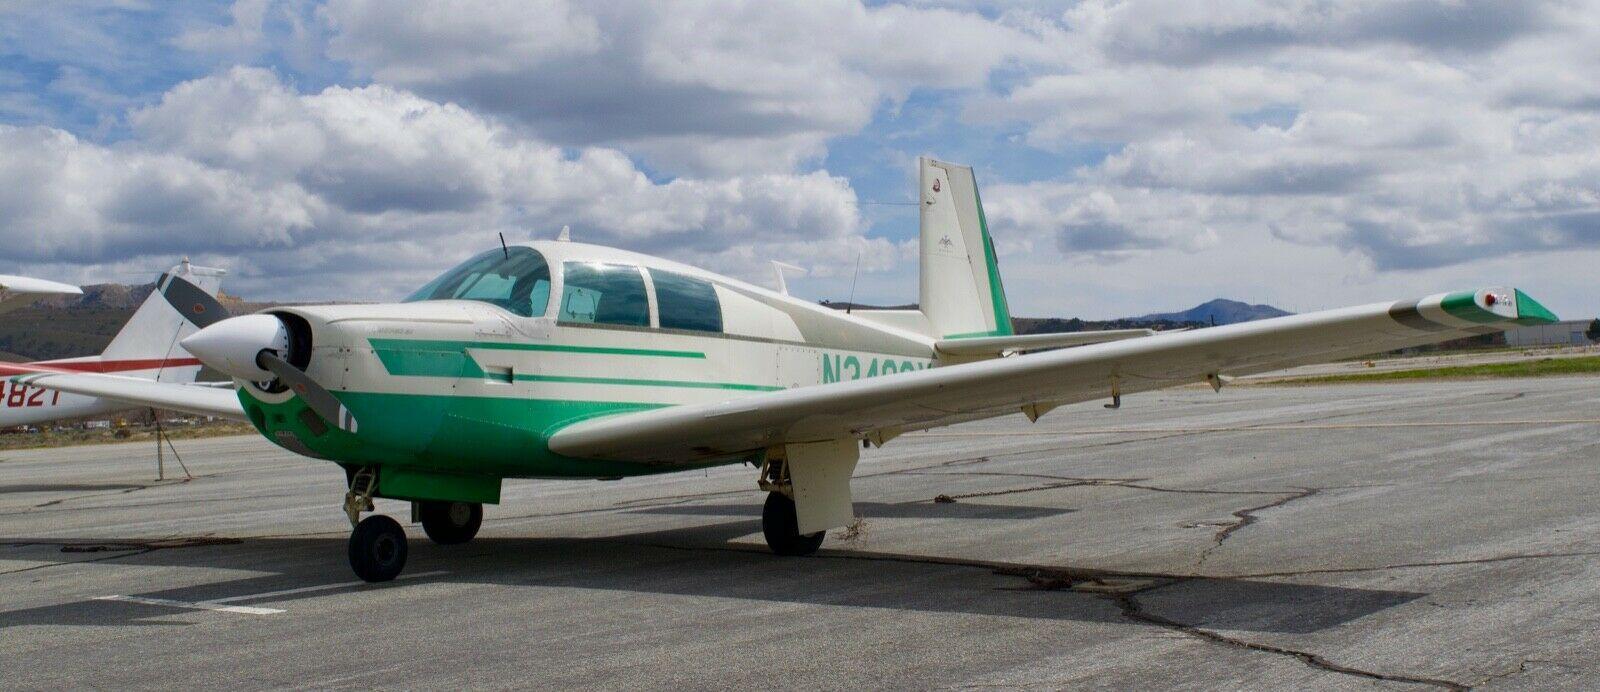 great shape 1966 Mooney M20E aircraft